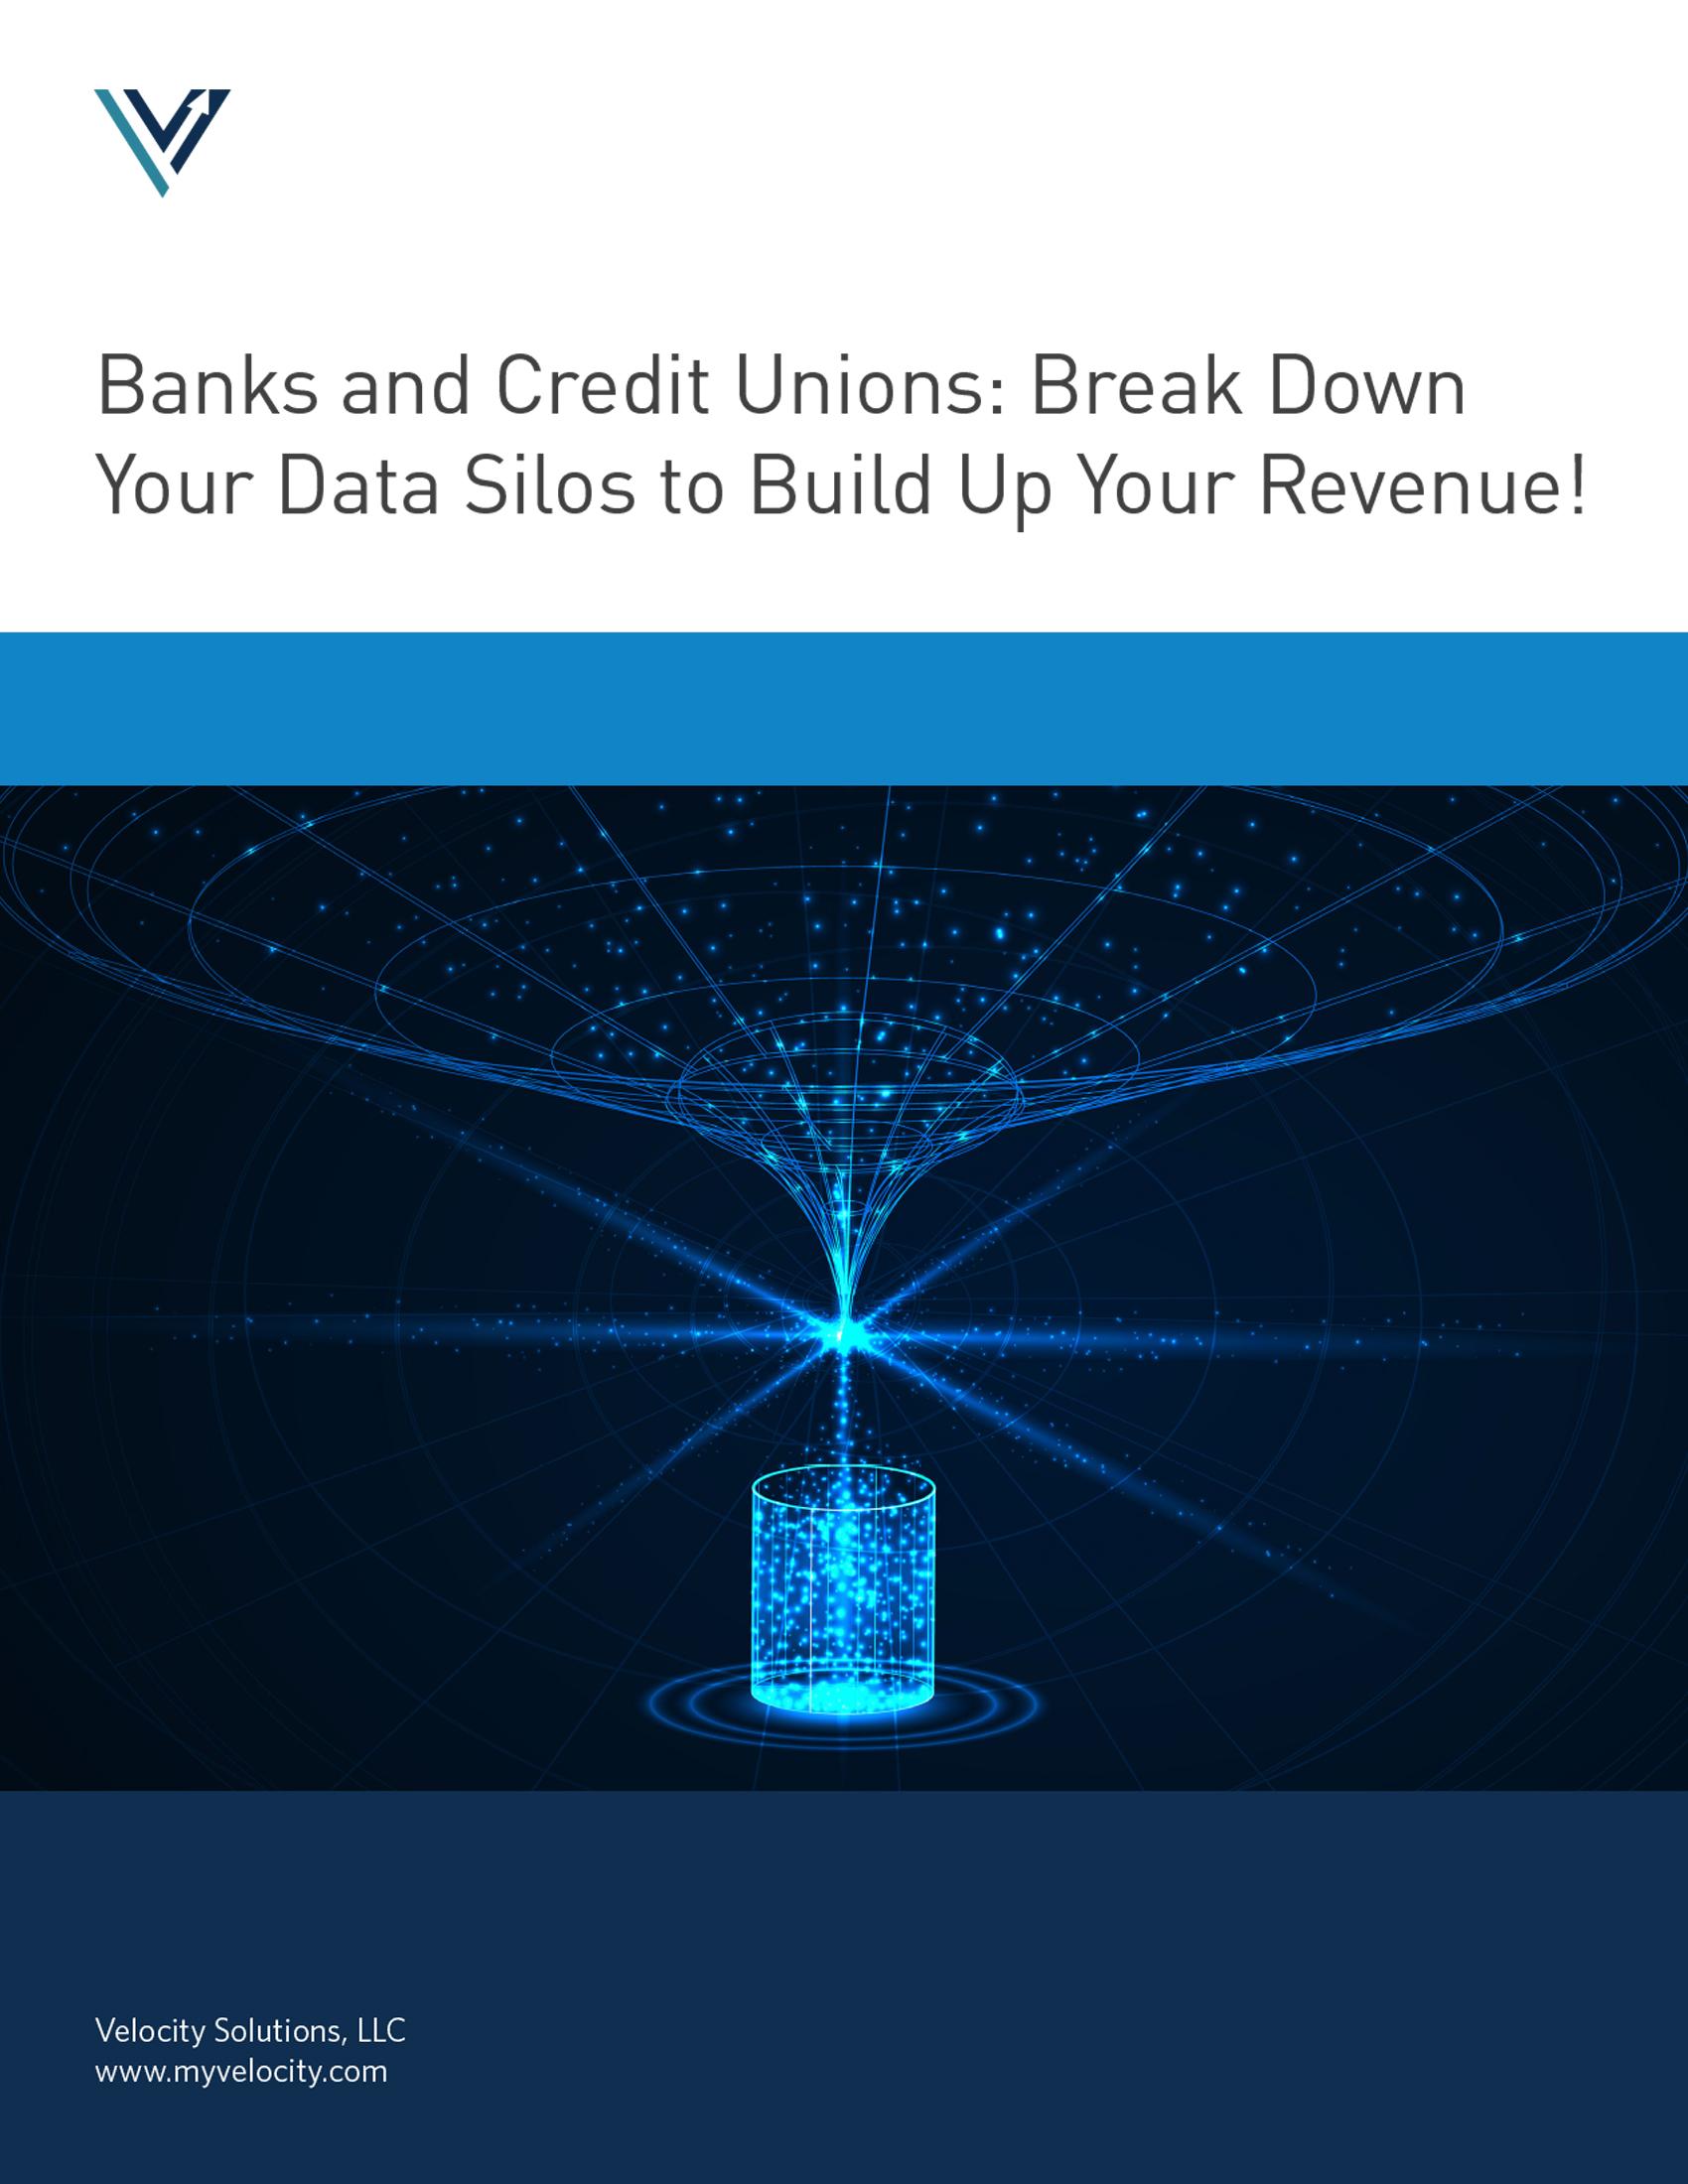 Data Silos Cover